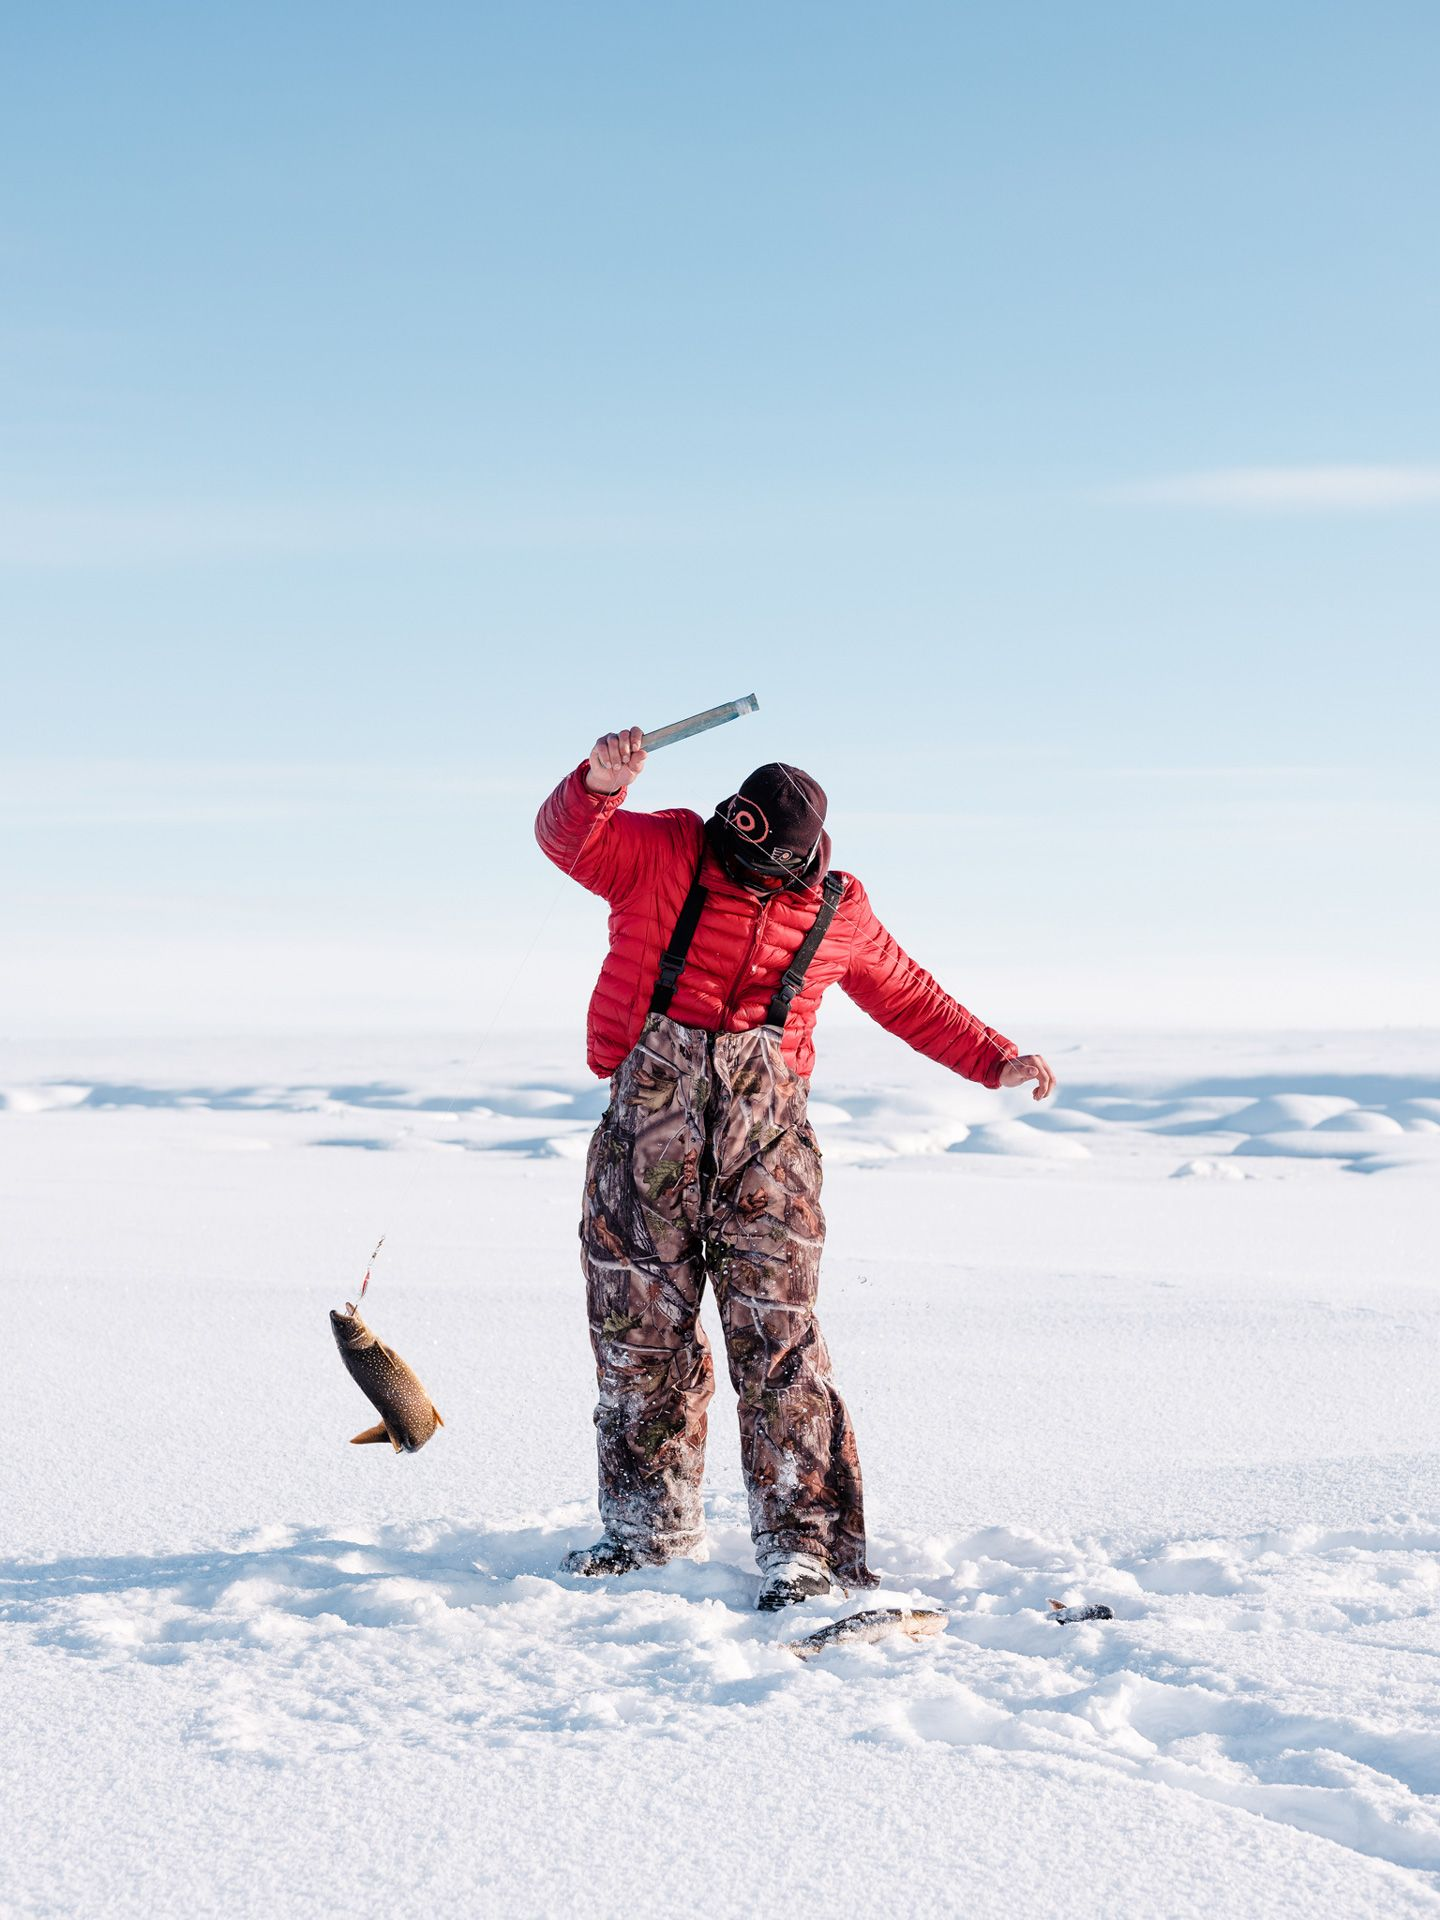 men ice-fishing on lake catching fish in Nunavik by Alexi Hobbs for Air Inuit